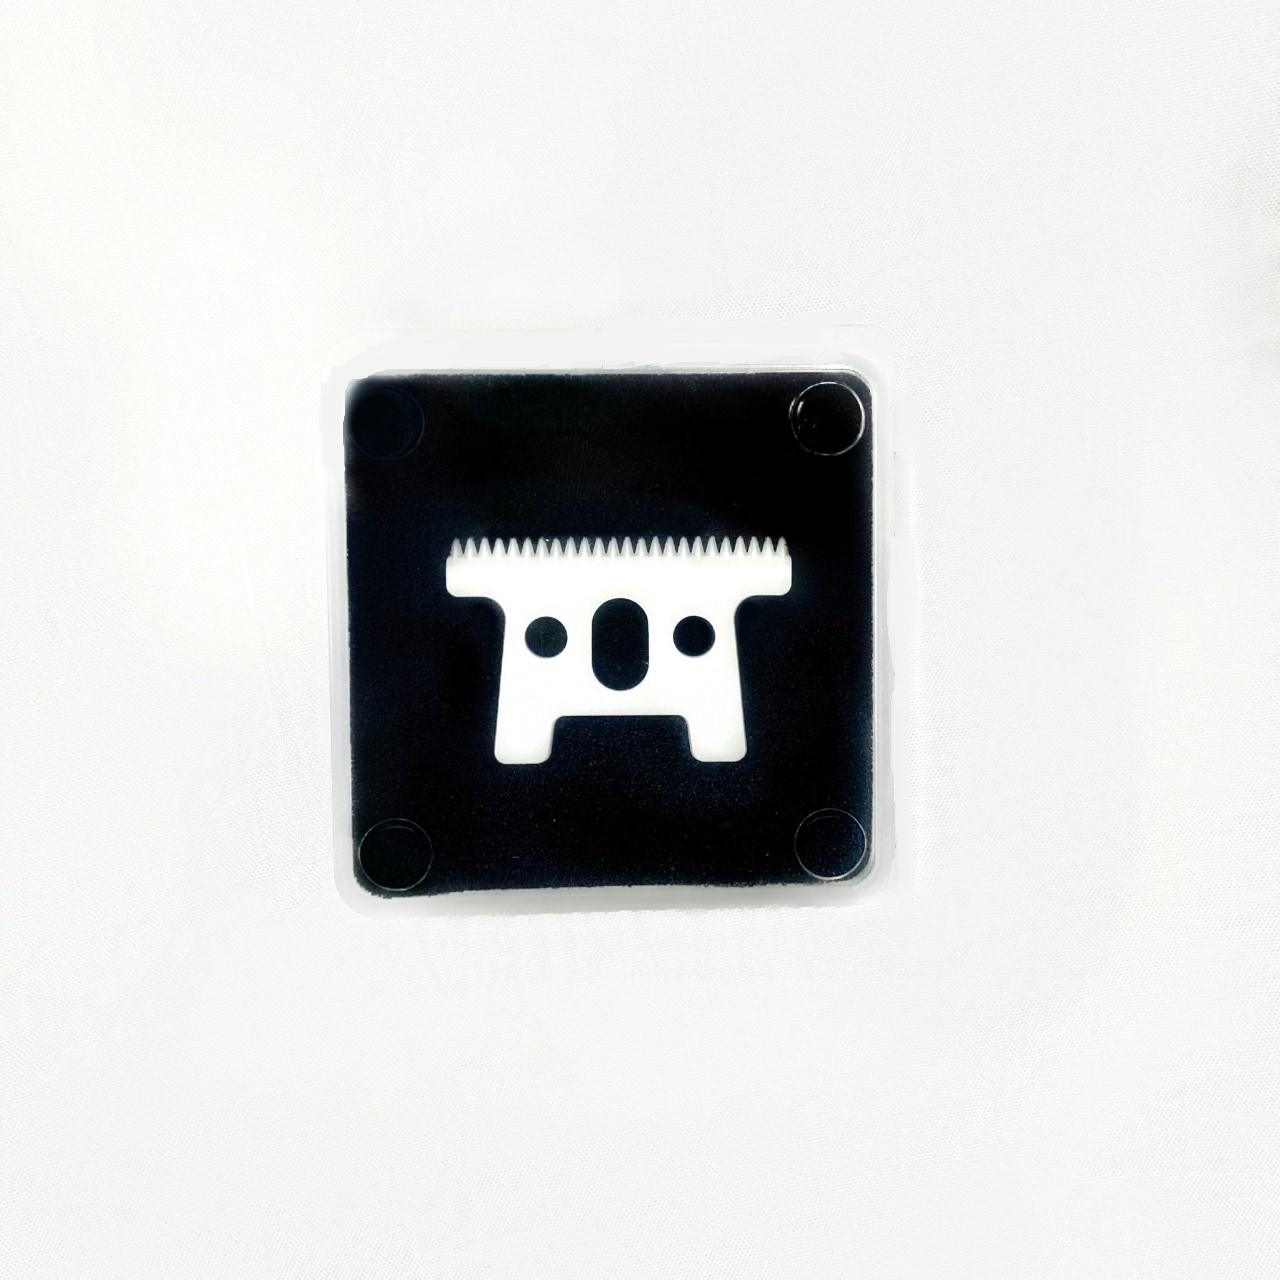 ABBS Ceramic Cutter - Slimline Pro Li